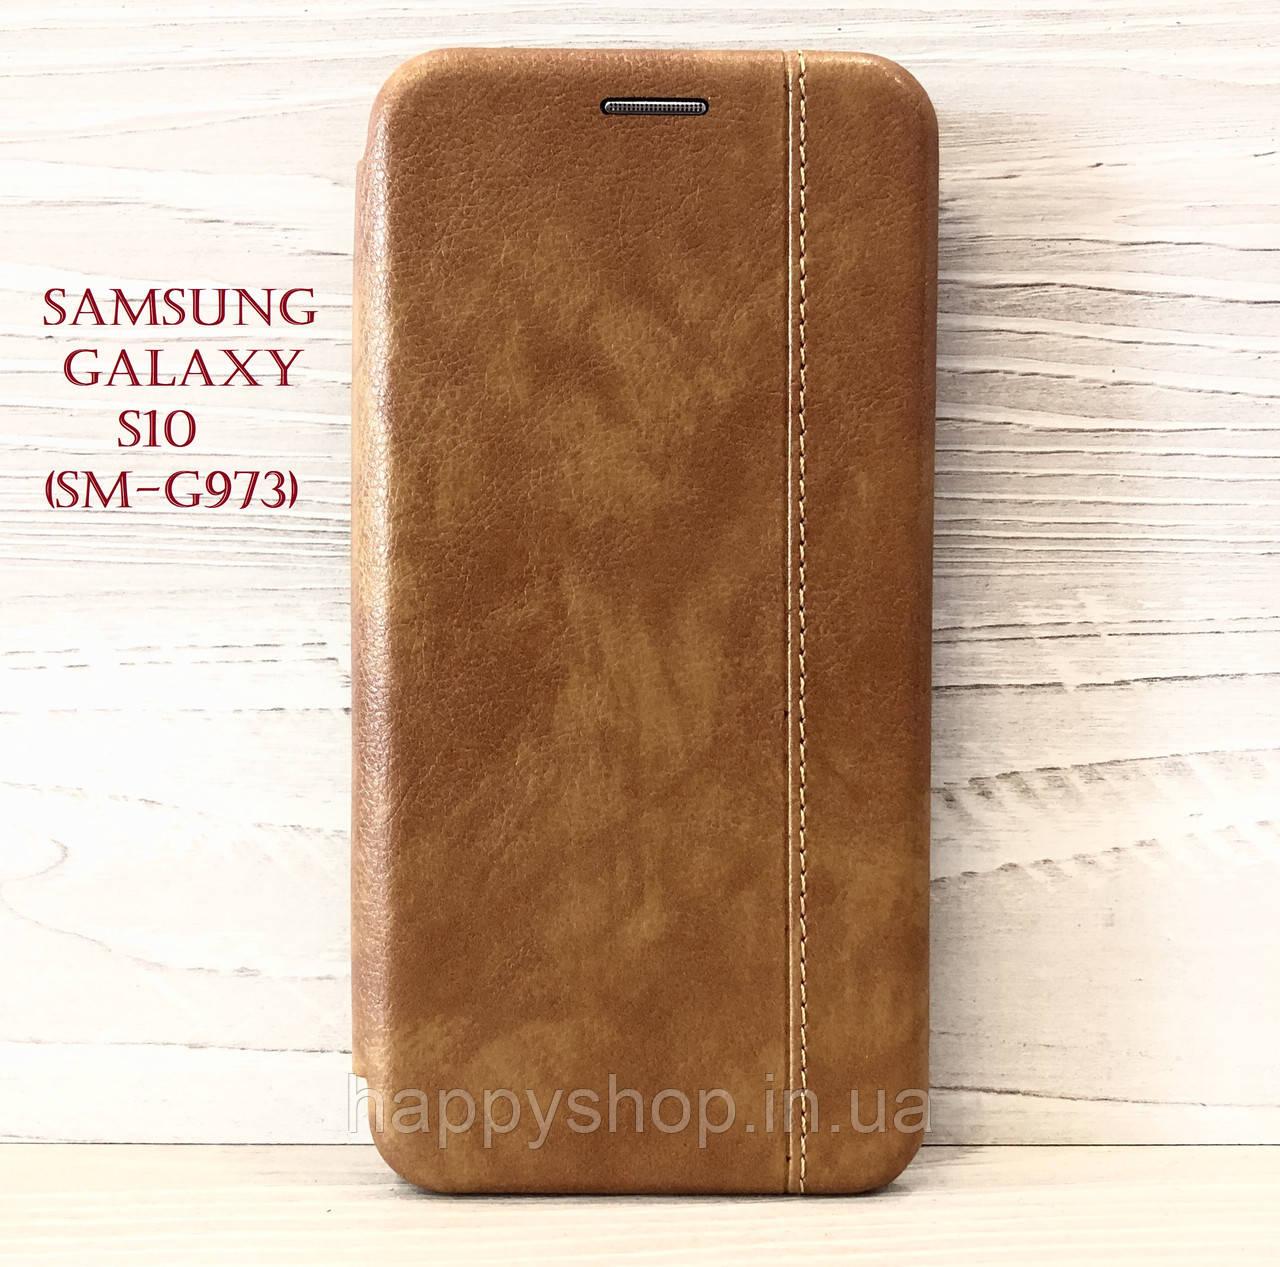 Чехол-книжка Gelius Leather для Samsung Galaxy S10 (SM-G973) Коричневый